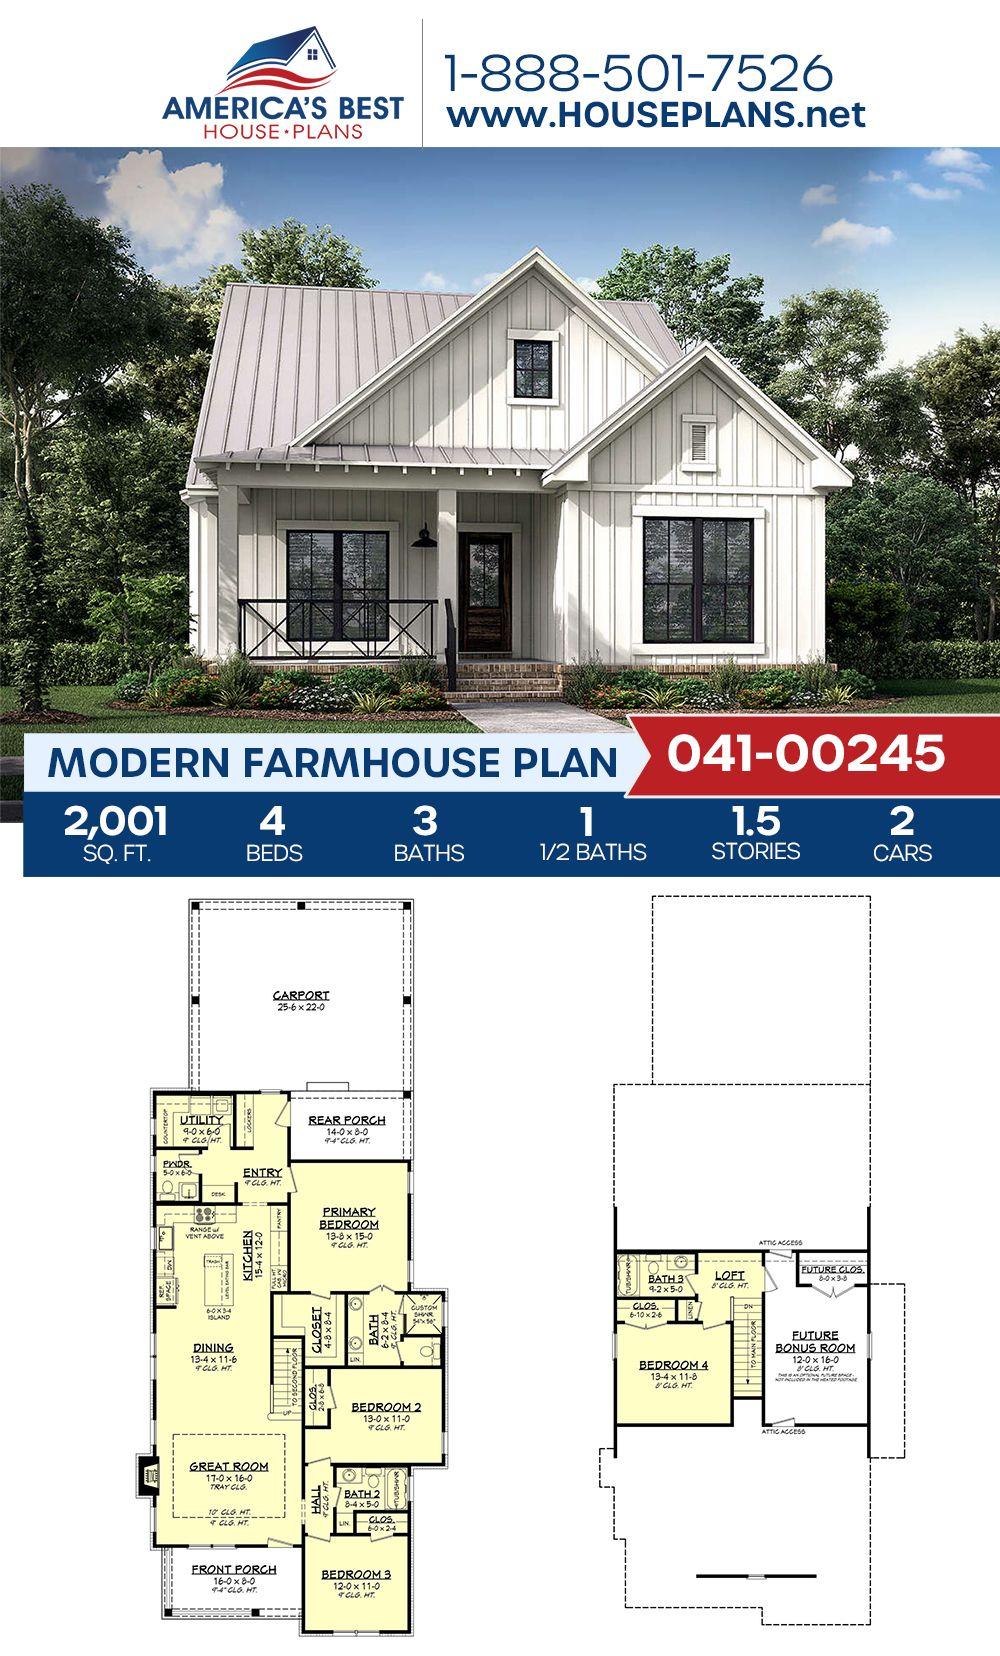 House Plan 041 00245 Modern Farmhouse Plan 2 001 Square Feet 4 Bedrooms 3 5 Bathrooms In 2021 Modern Farmhouse Plans Farmhouse Plans House Plans Farmhouse